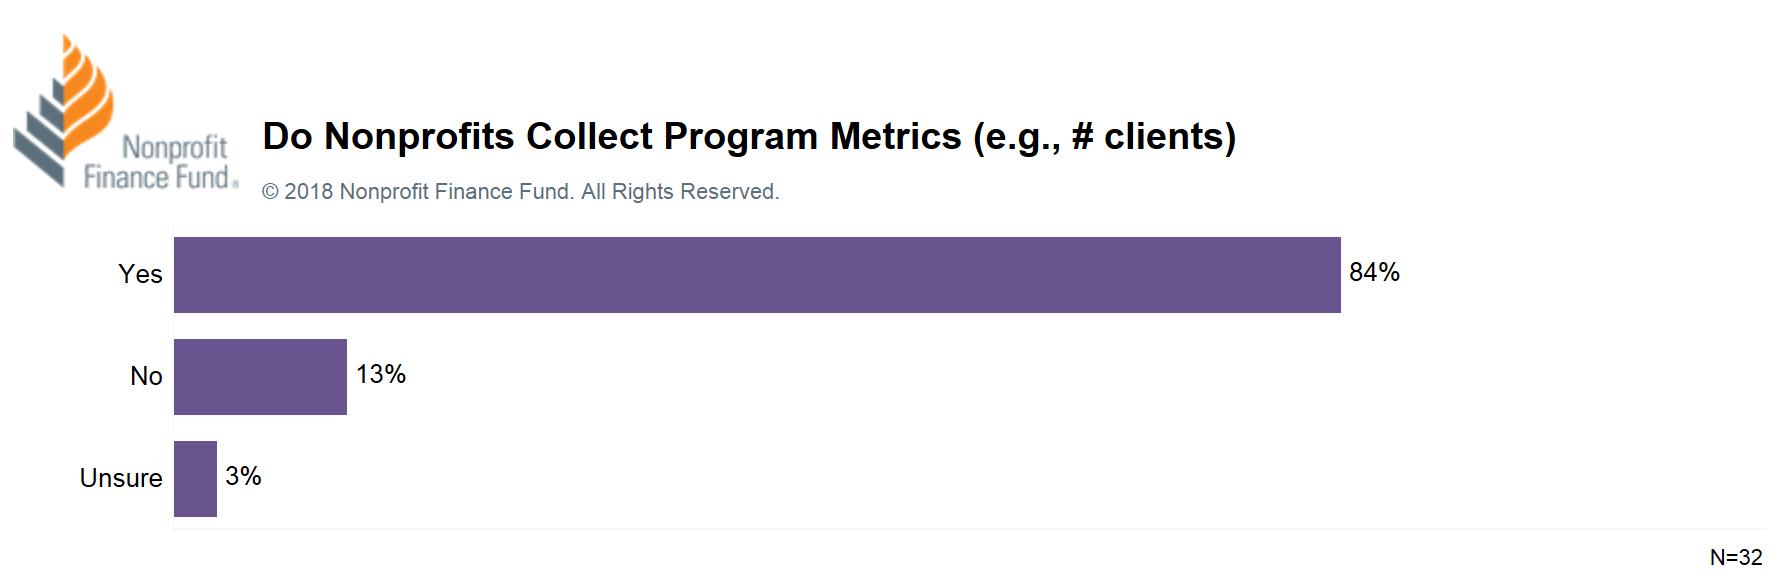 collect metrics 3.png